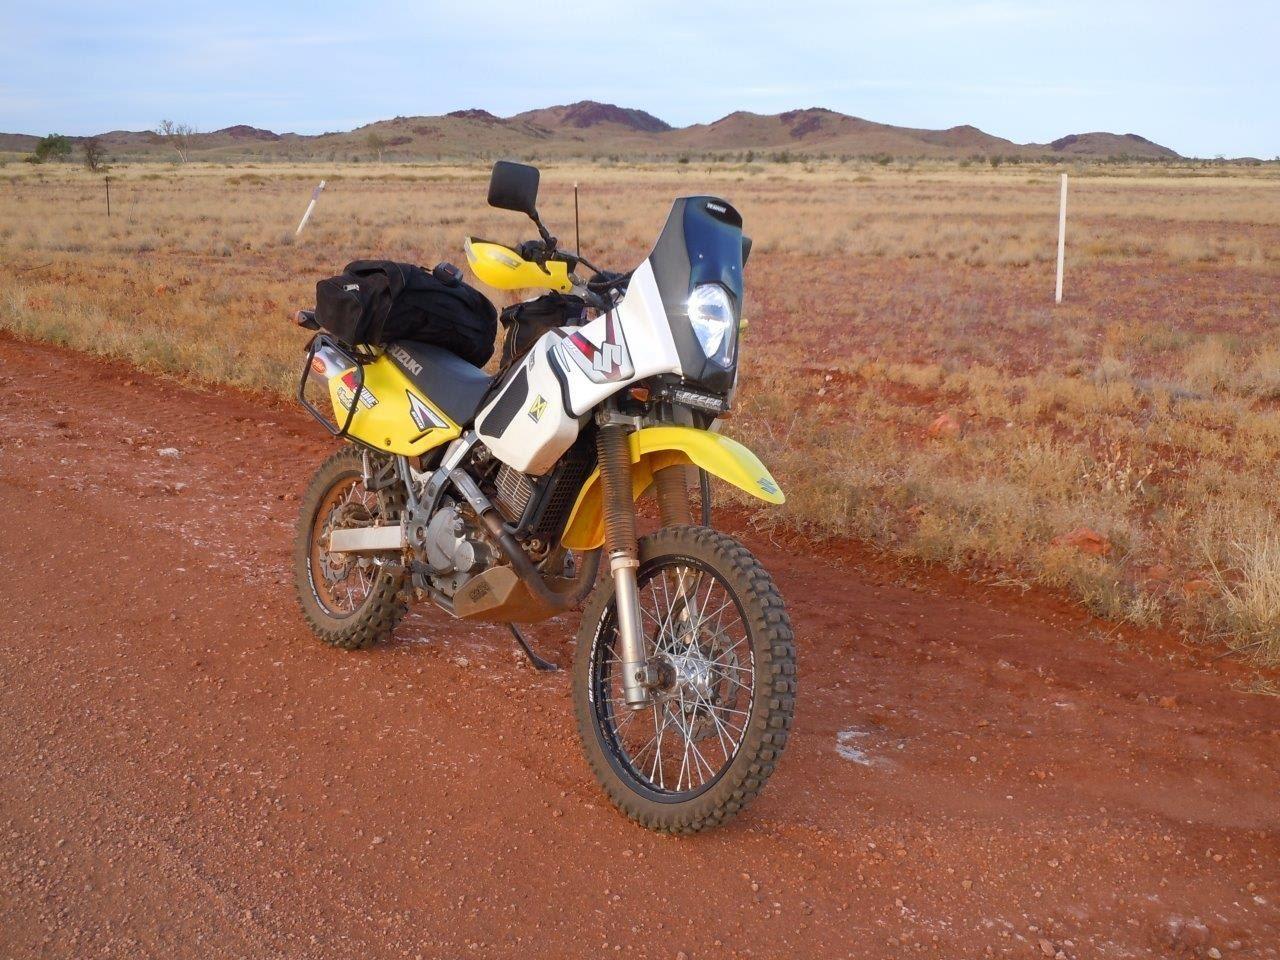 Yenkro Motorcycle Accessories Adventure Bike Motorcycle Accessories Adventure Motorcycling